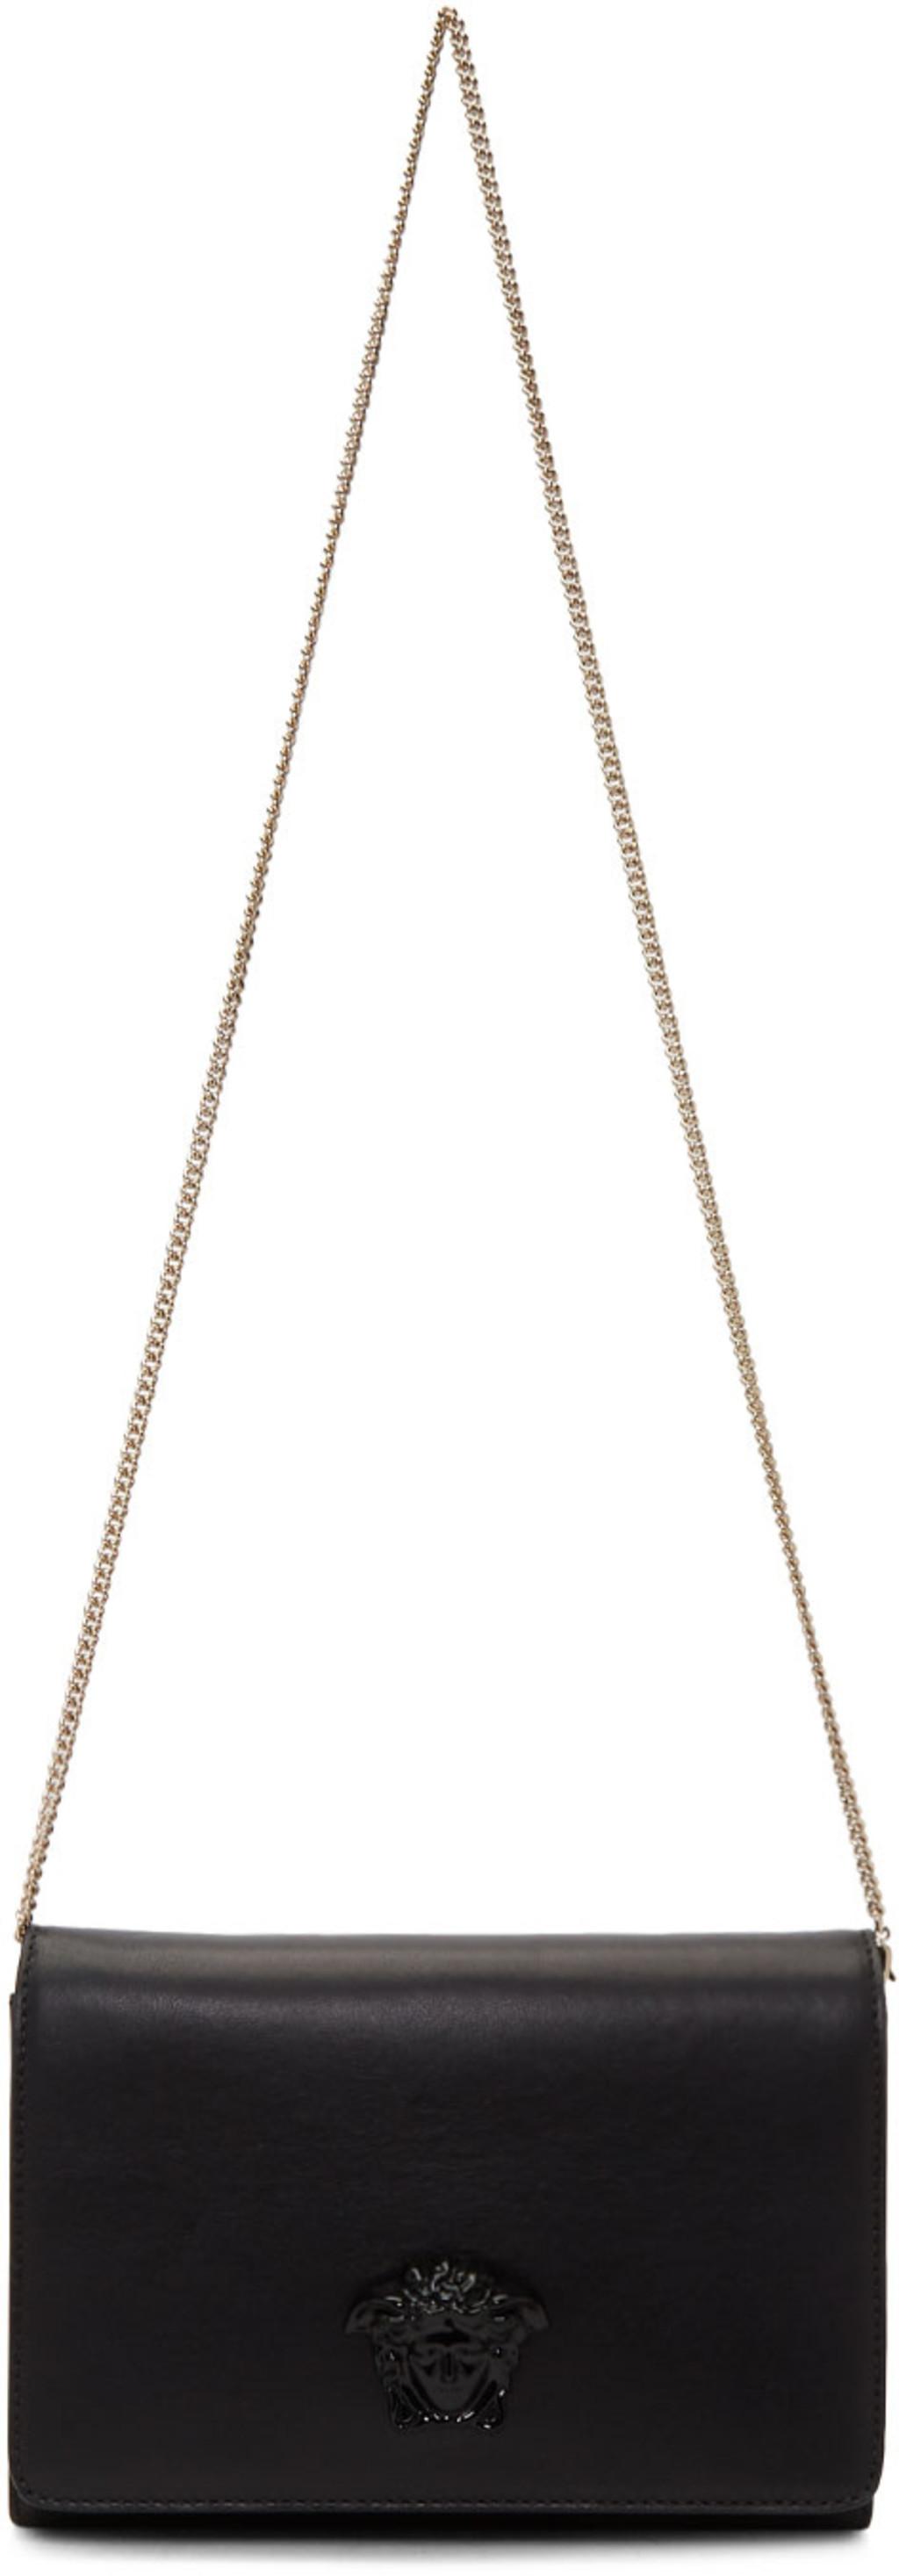 Black Tribute Medusa Wallet Chain Bag Versace